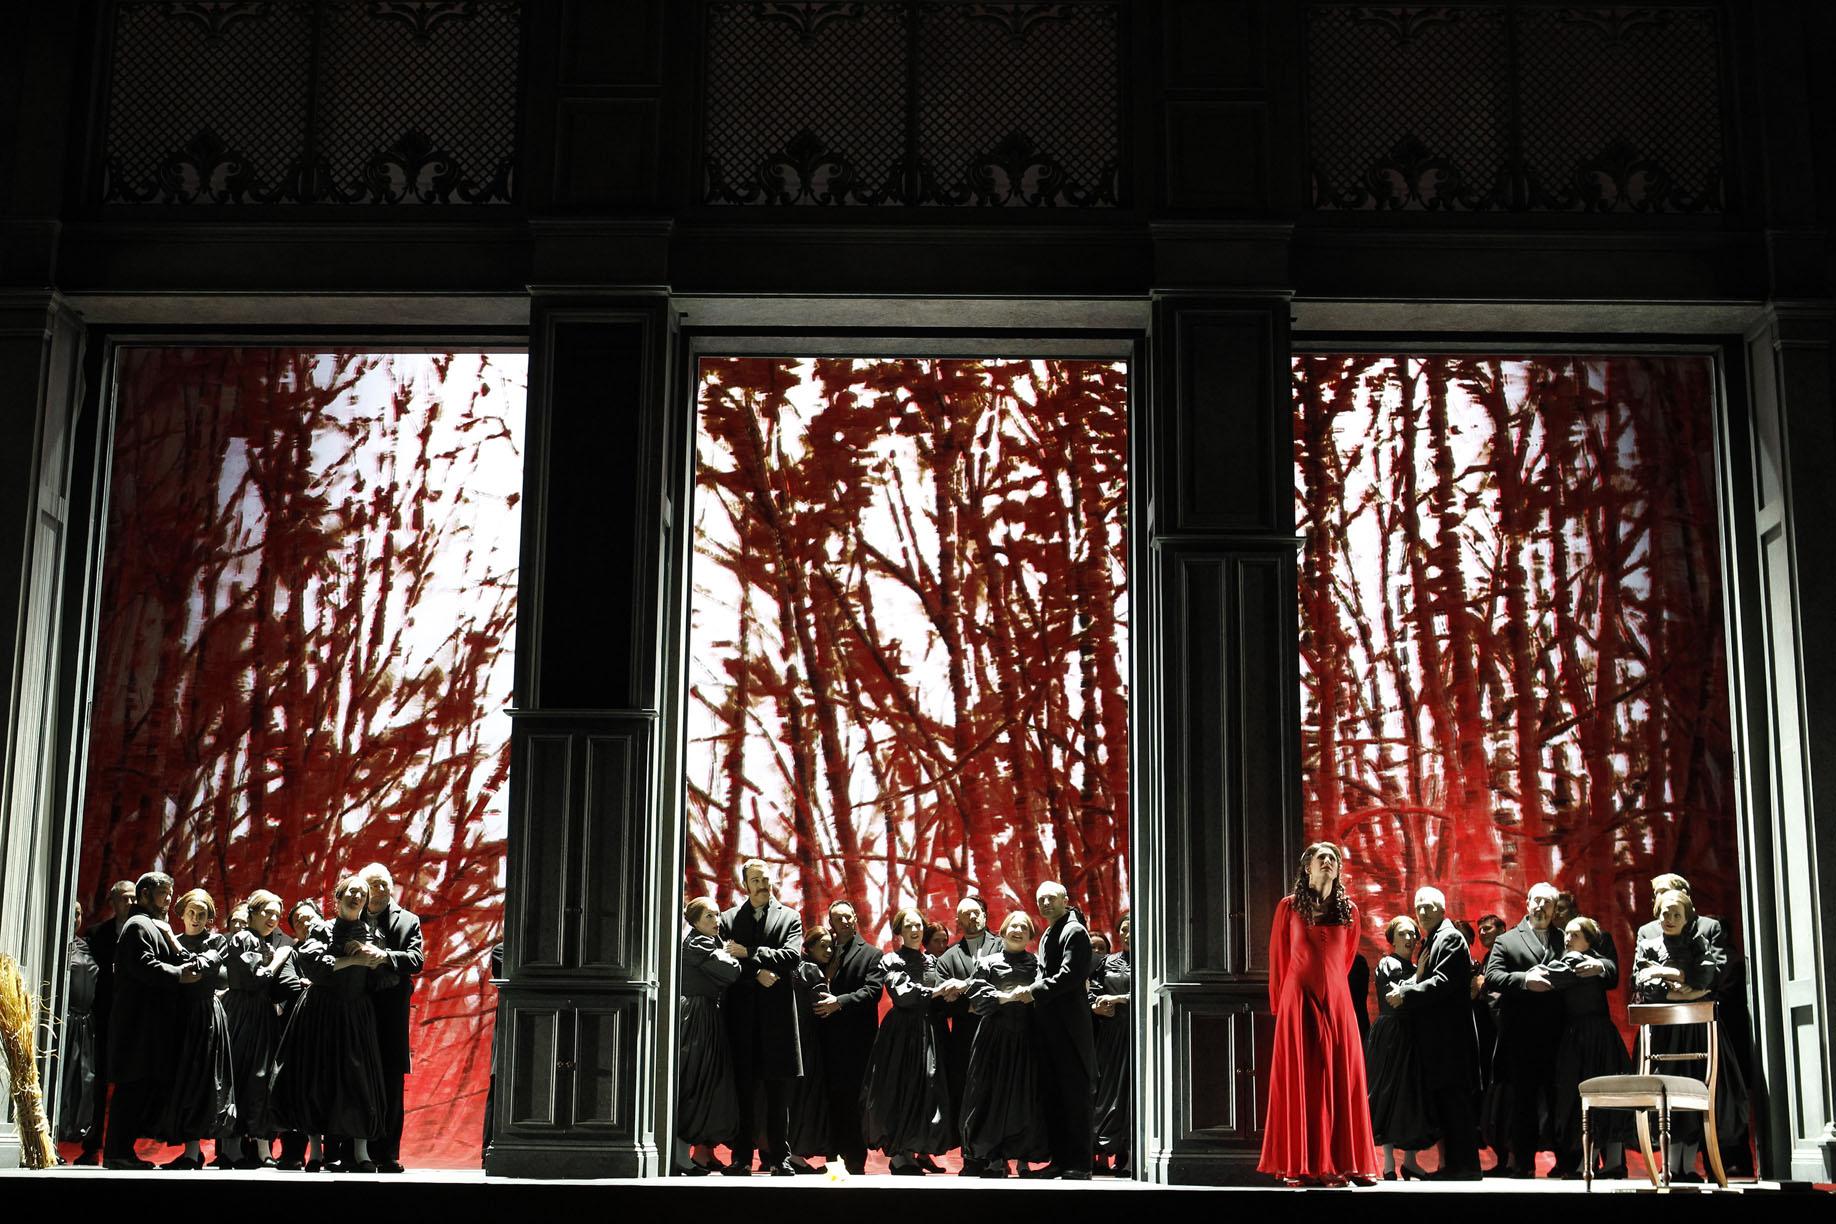 eugene onegin comparison The metropolitan opera's current production of tchaikovsky's eugene onegin debuted in 2013, with soprano anna netrebko as tatiana, baritone mariusz kwiecien as onegin, and tenor piotr.